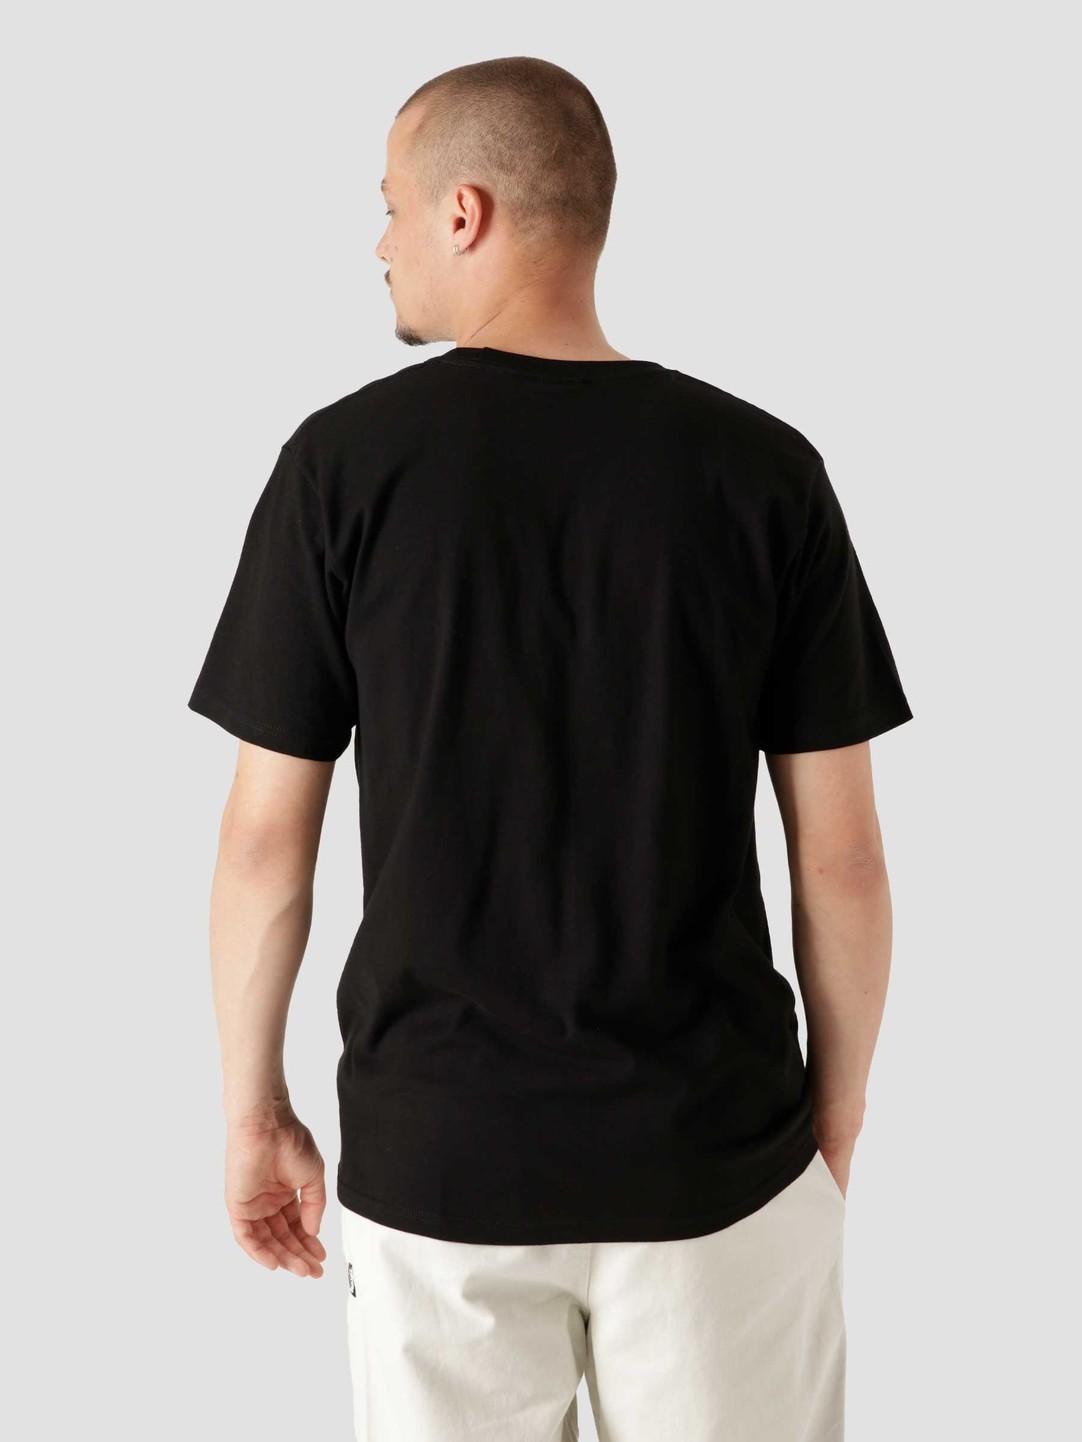 Stussy Stussy 3 People T-Shirt Black 1904683